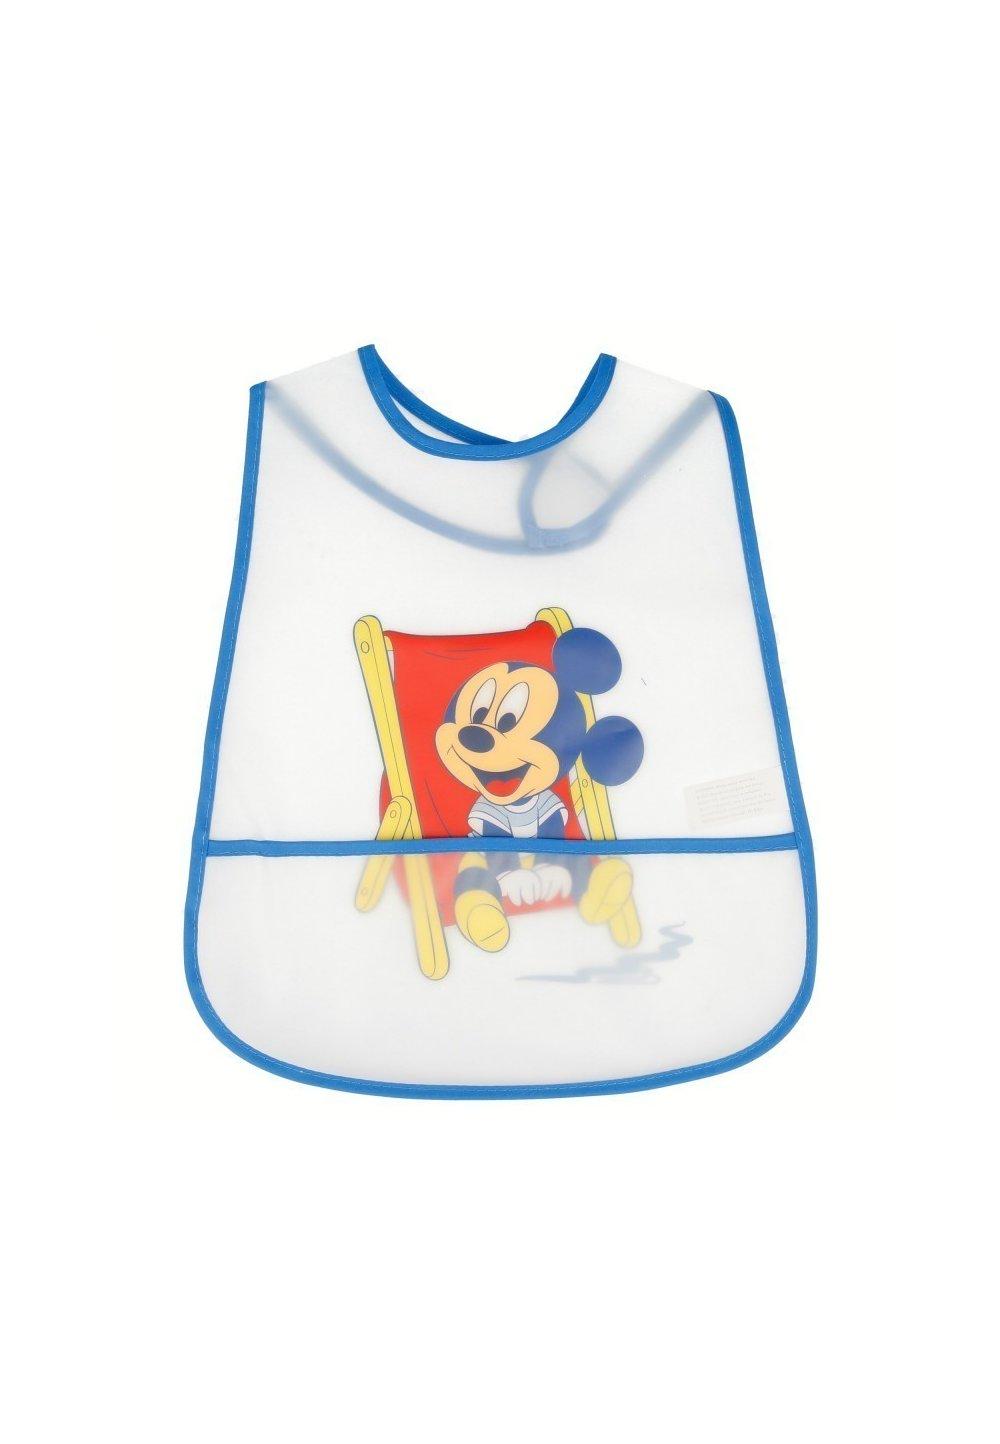 Baveta, bebe Mickey Mouse 6-12 luni imagine